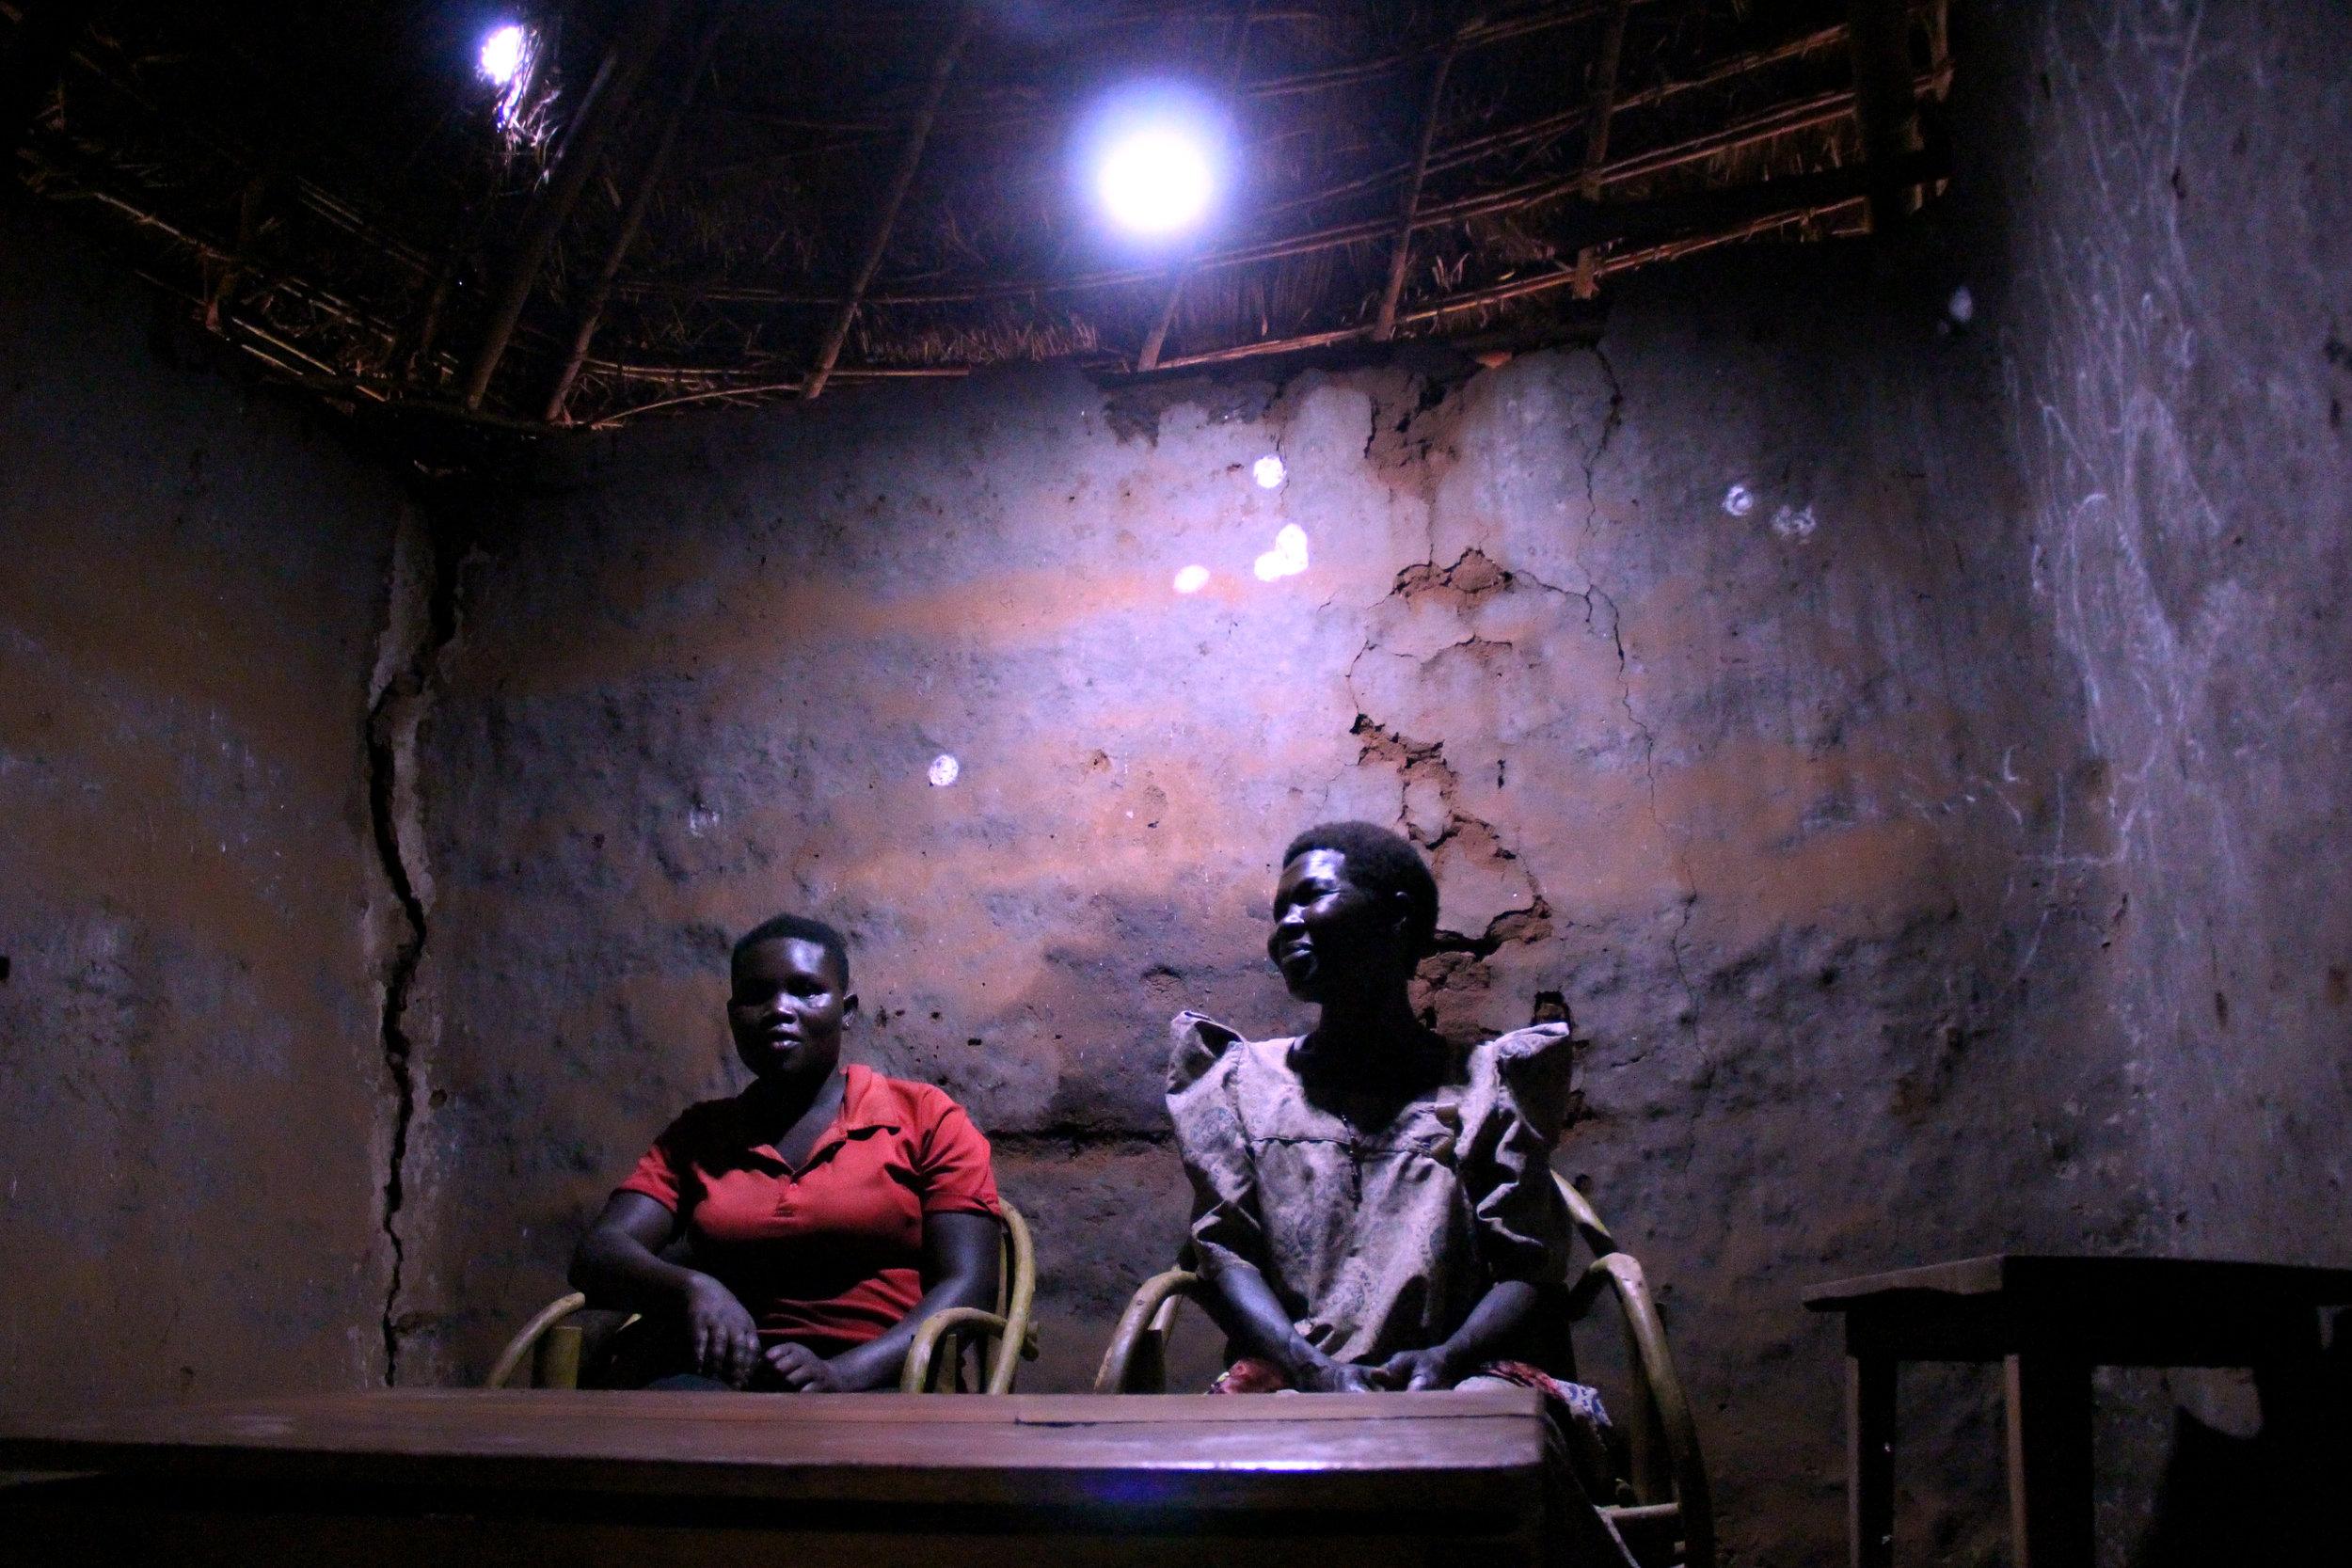 181118 - Uganda Home ligth 1.JPG